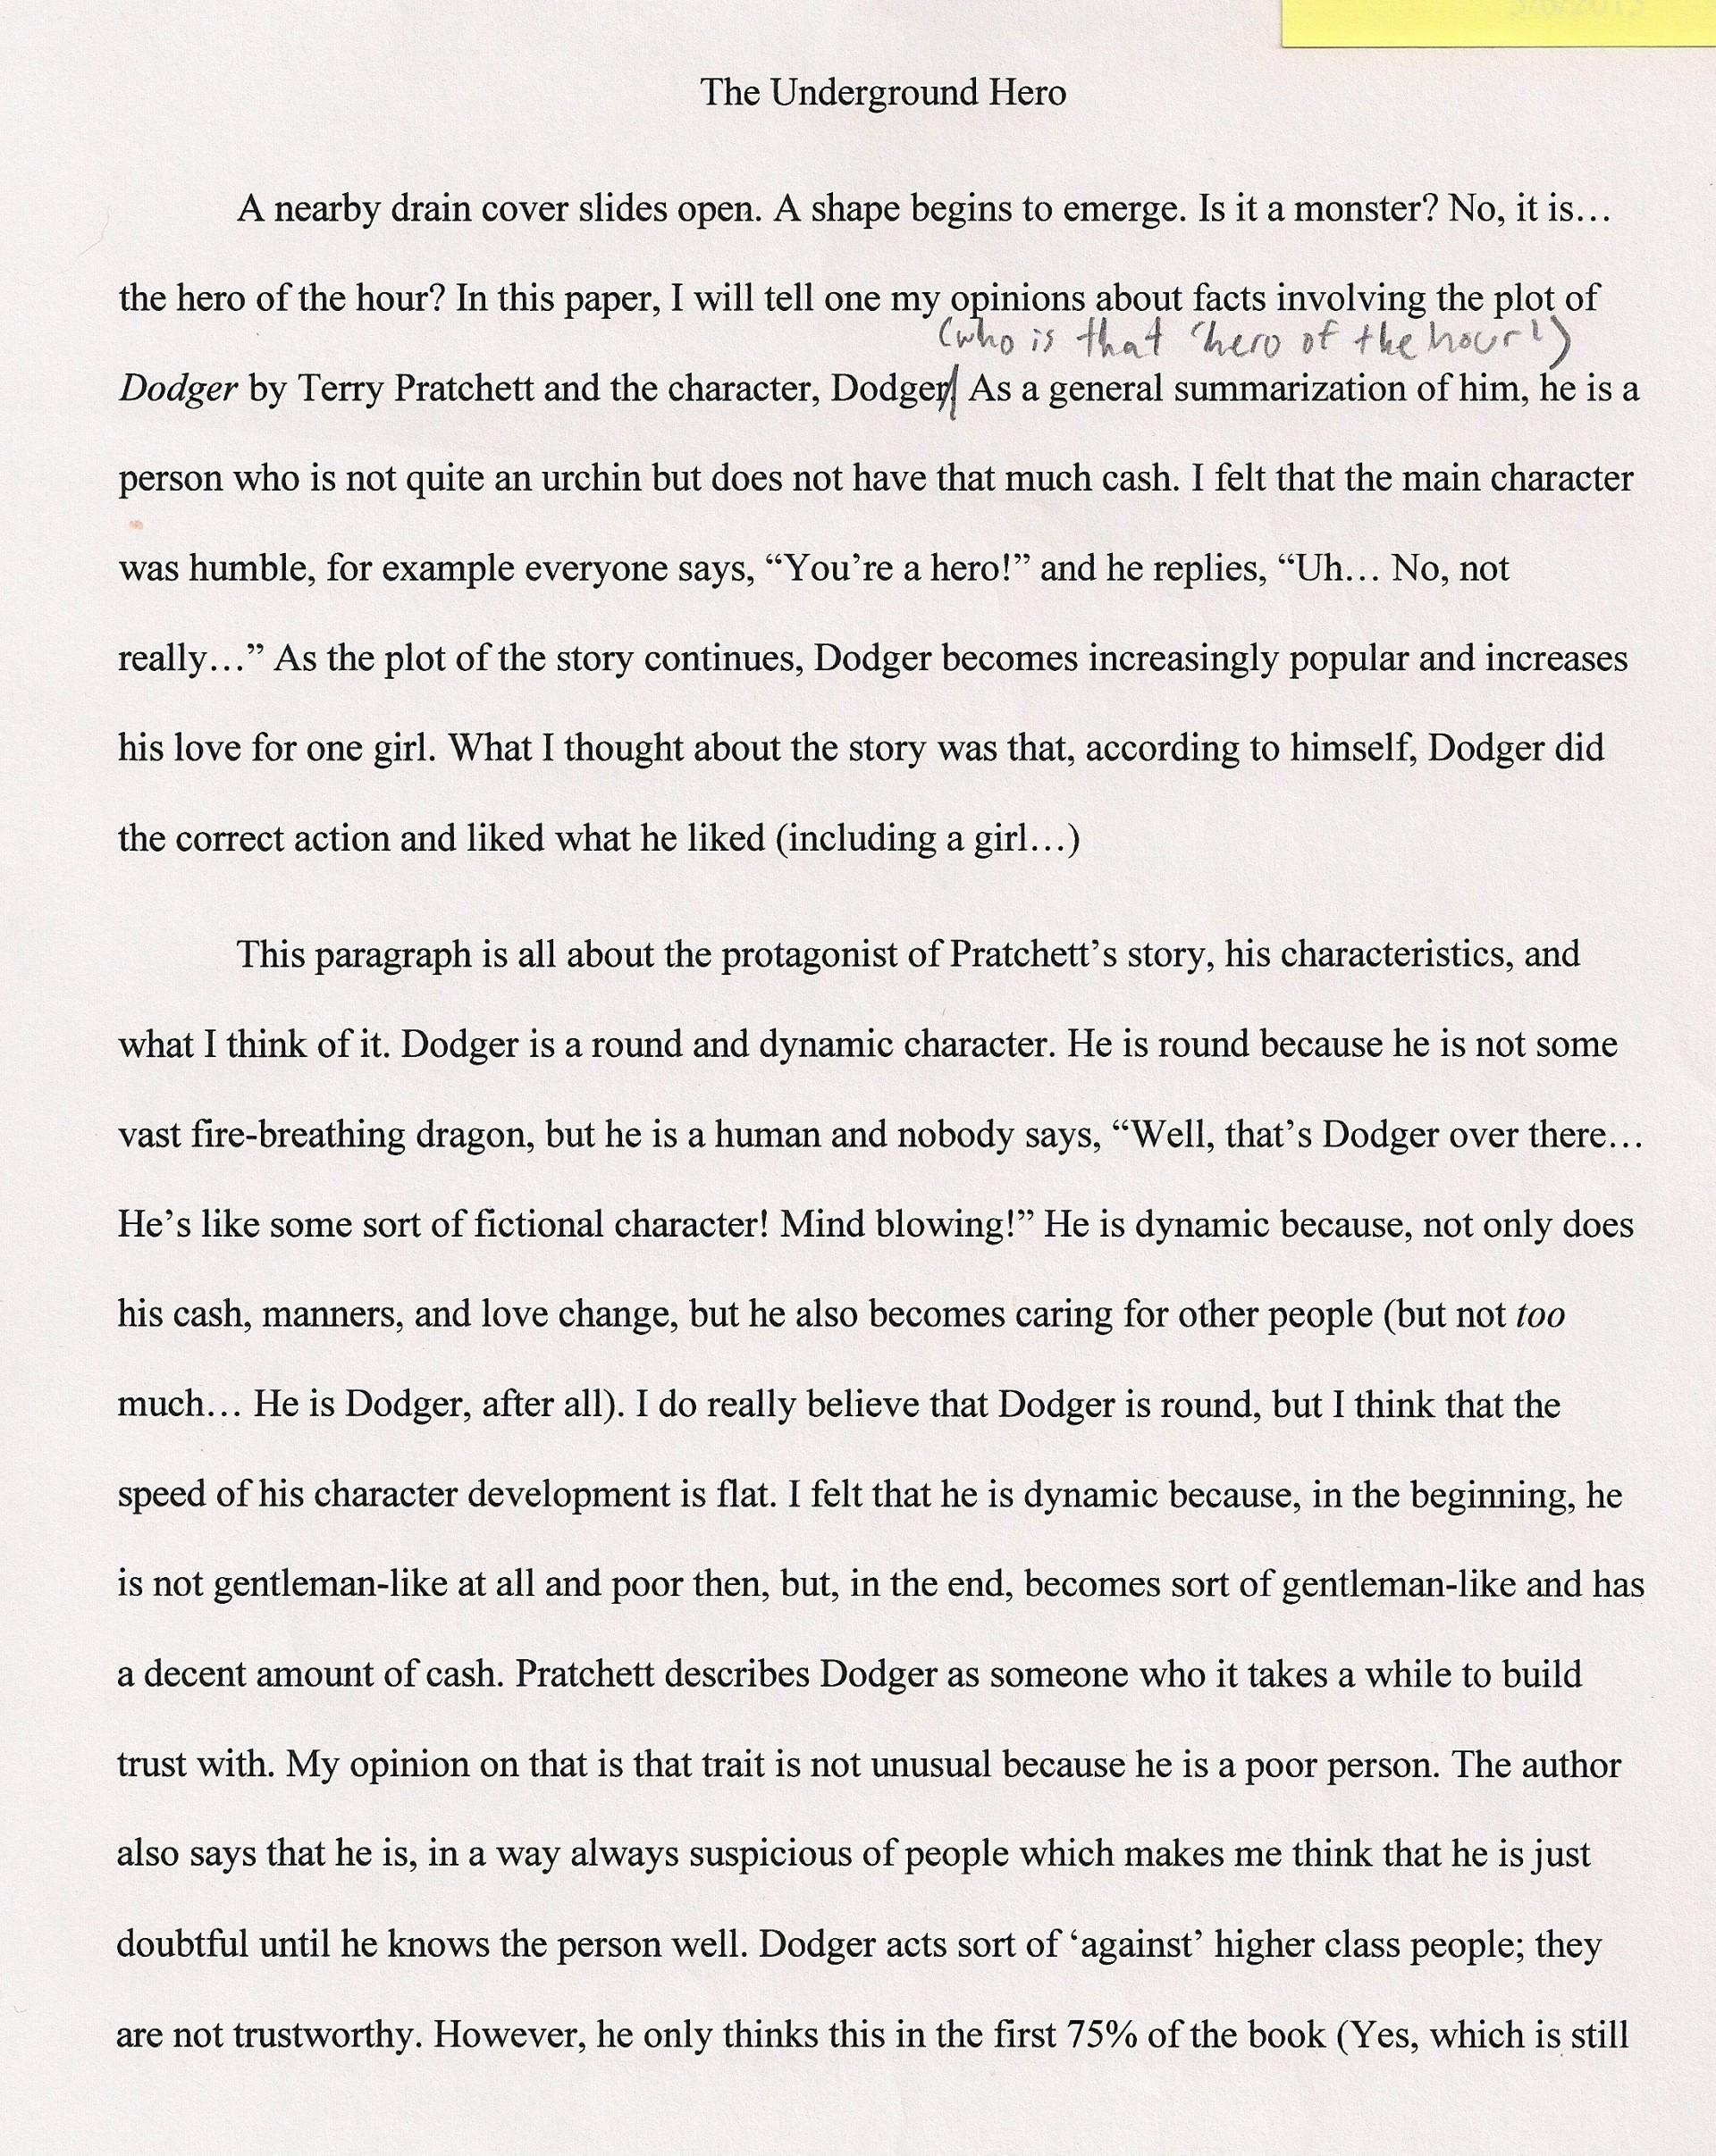 006 Unsung Heroes Essay Example The Underground Hero Fantastic Of India Intro My Mom 1920